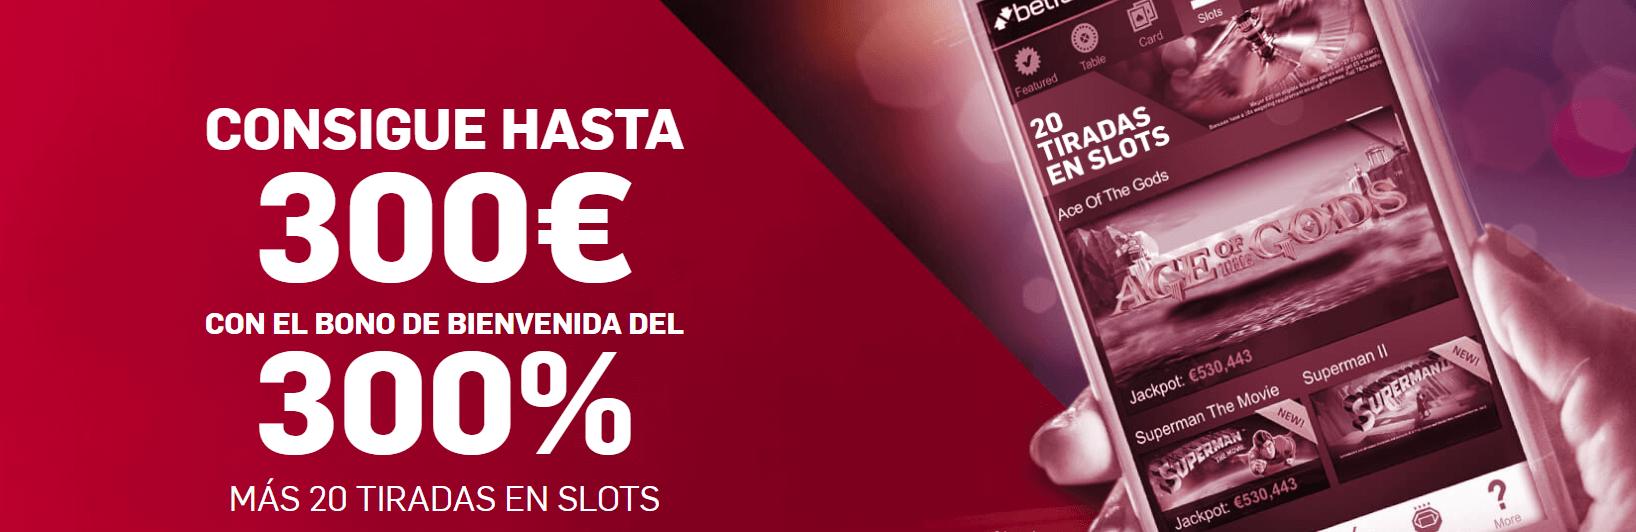 Descubre Betfair Casino y gana 300€ + 20 tiradas gratis